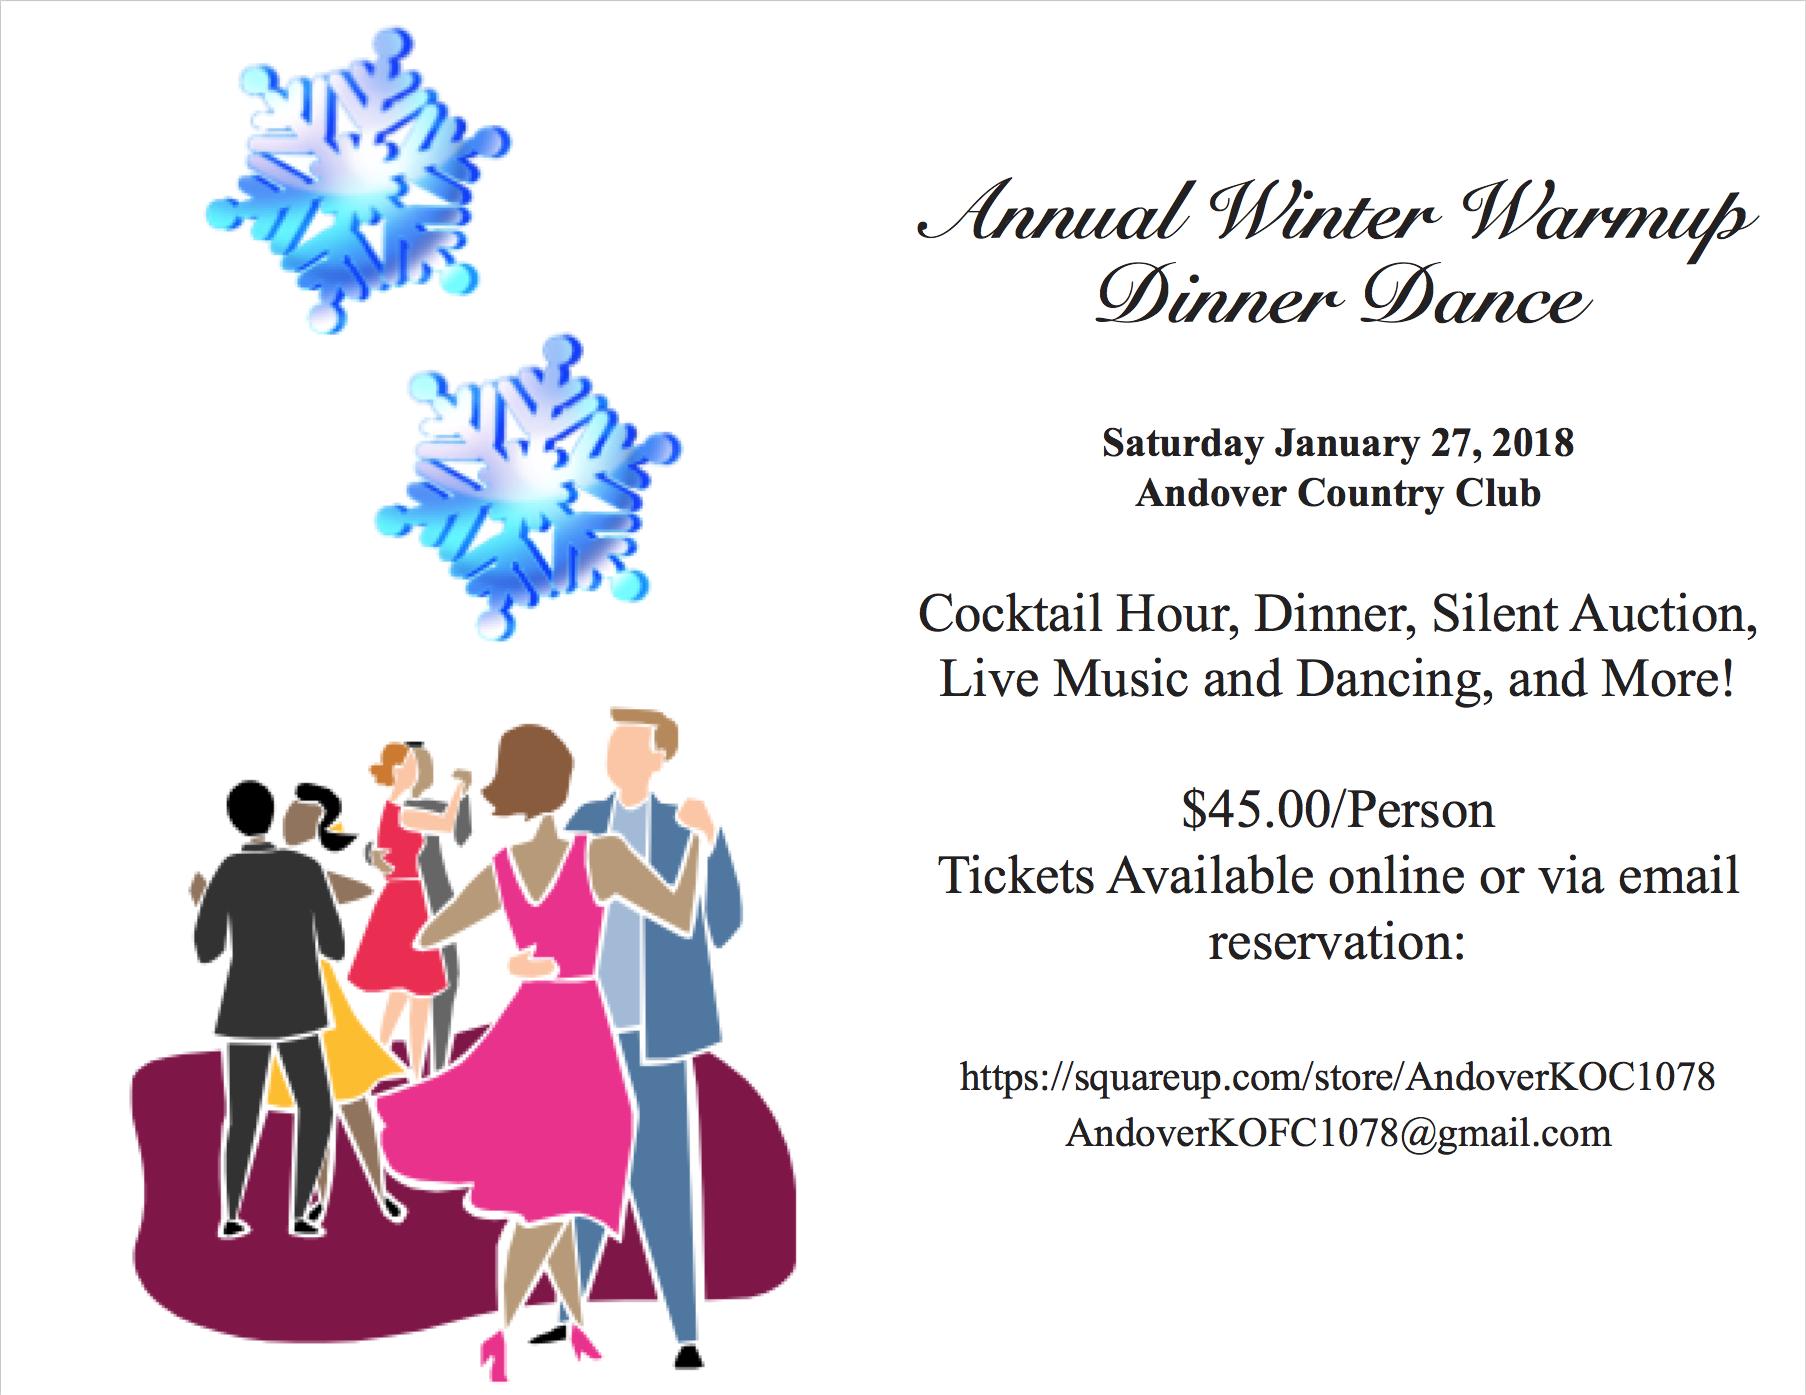 Annual Winter Warmup, Saturday, January 27, 2018, 6:00pm